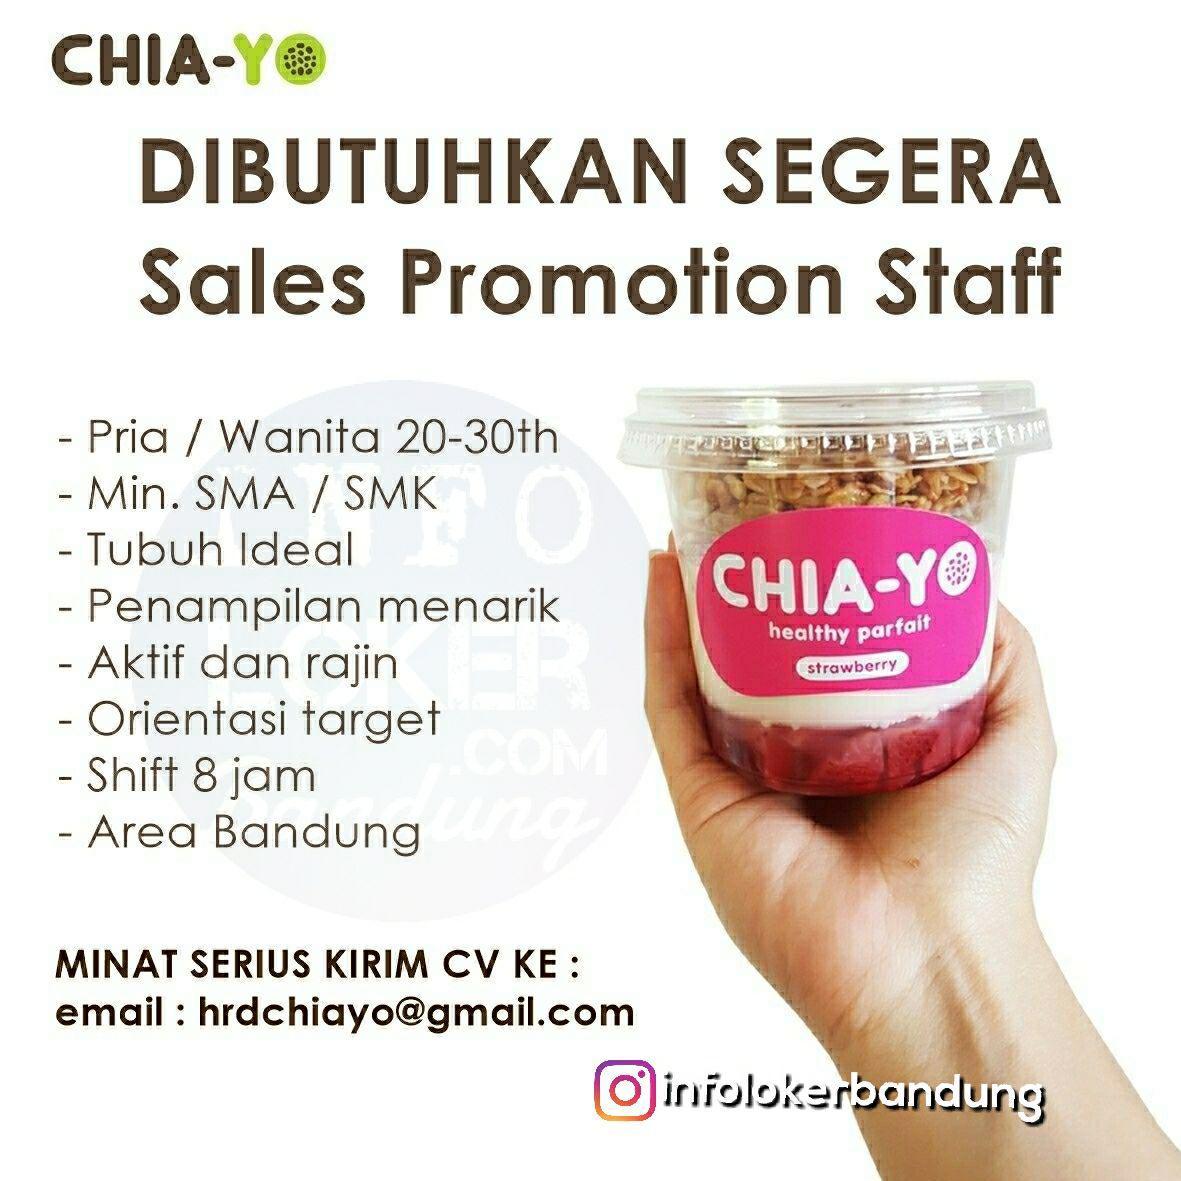 Lowongan Kerja Chia-yo Bandung April 2018